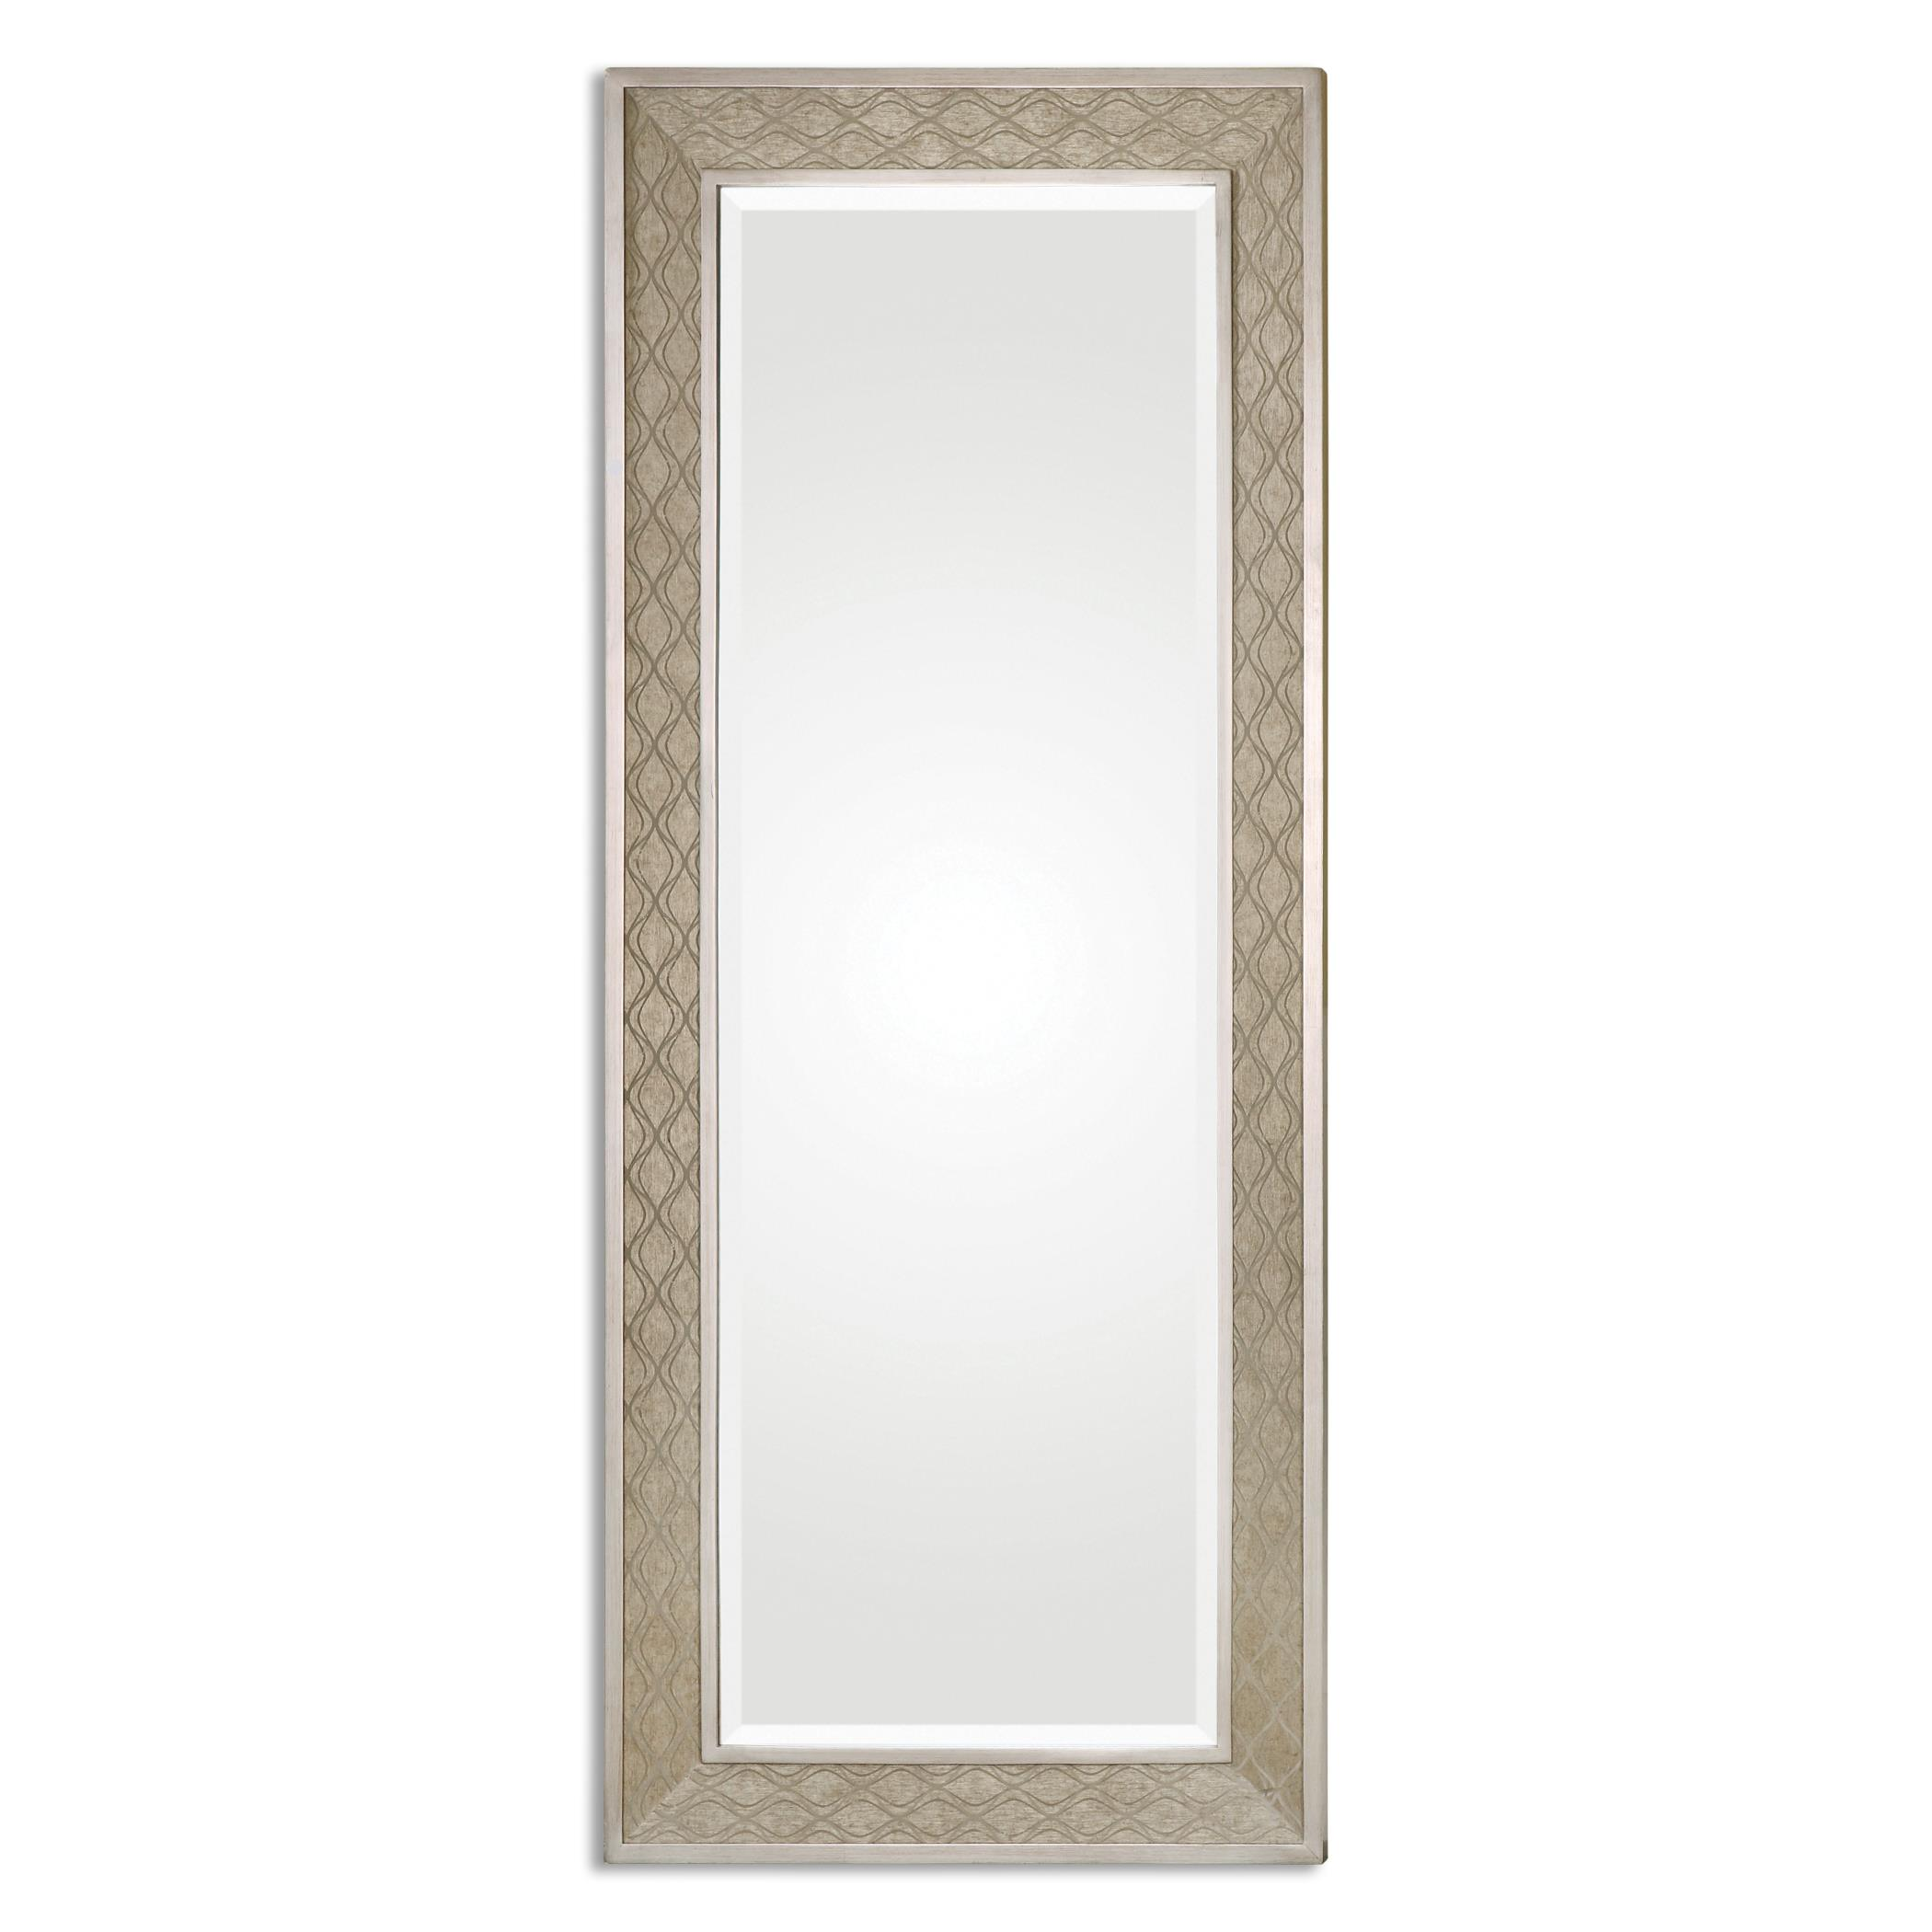 Uttermost Mirrors Masone Leaner Mirror - Item Number: 14497